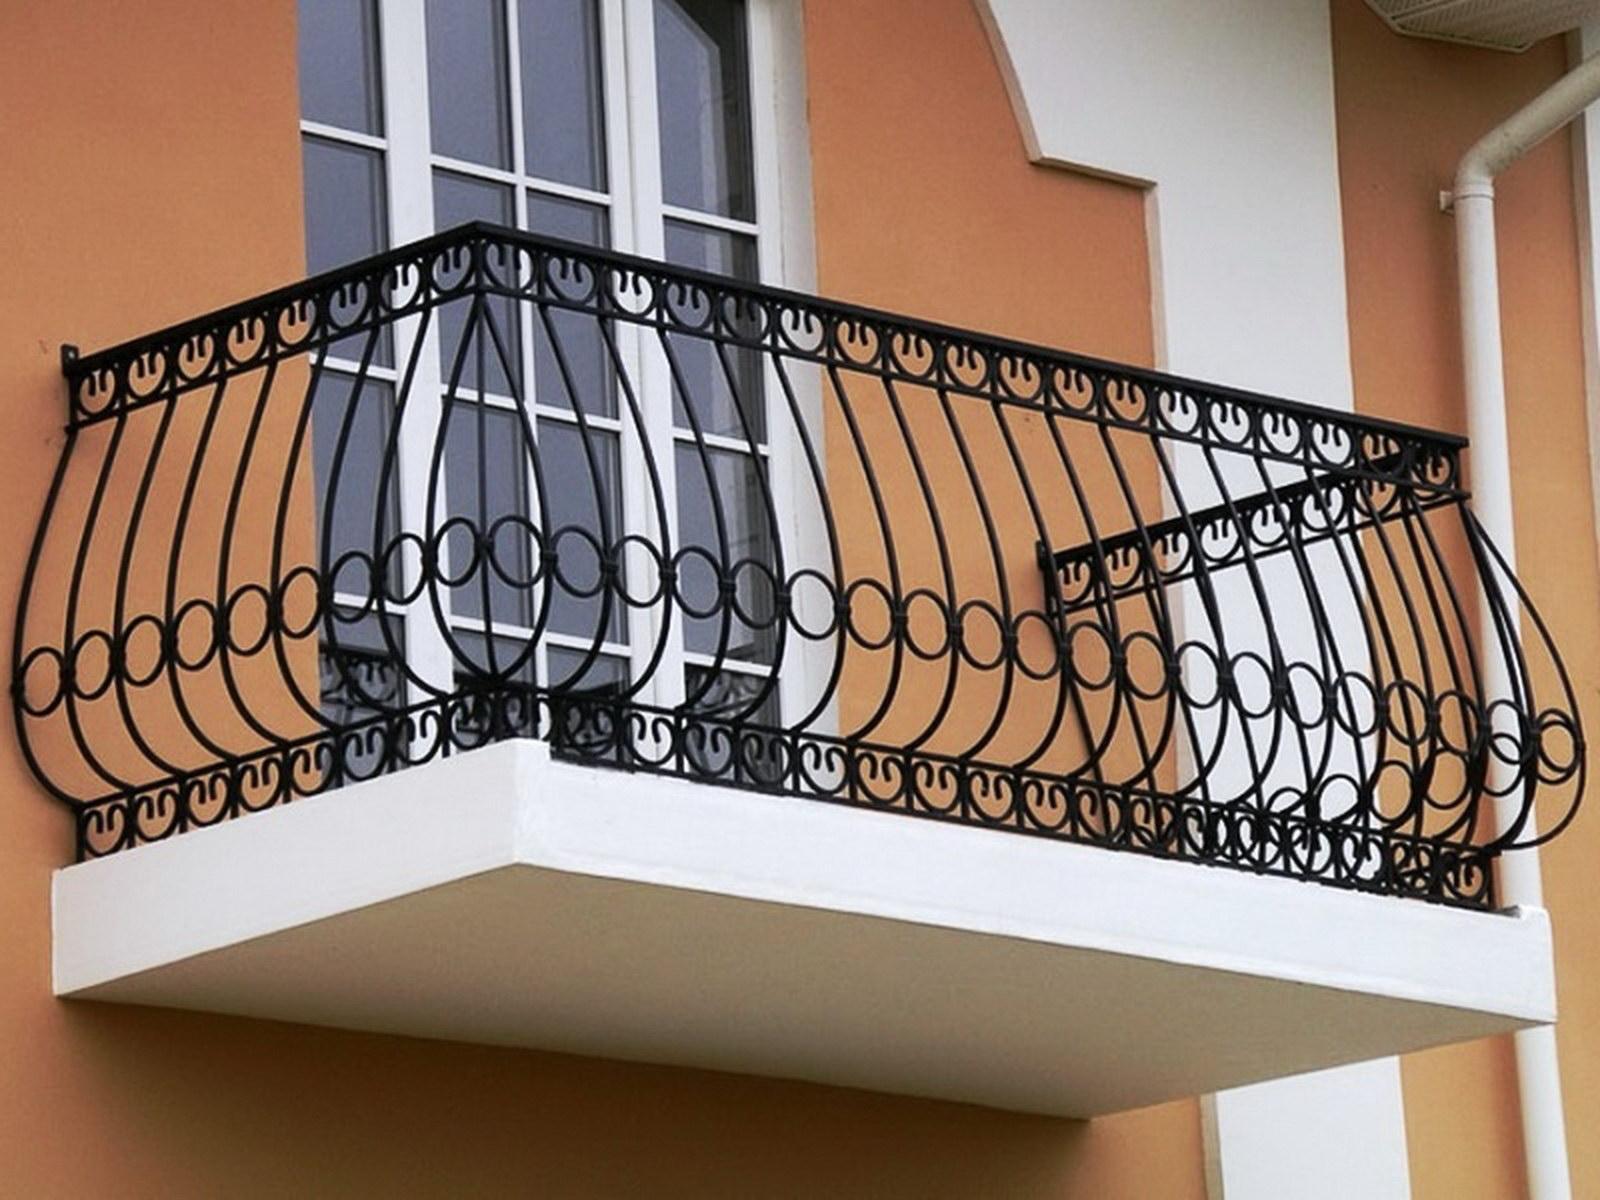 Изготовление и установка решеток на балконы и окна - балконс.